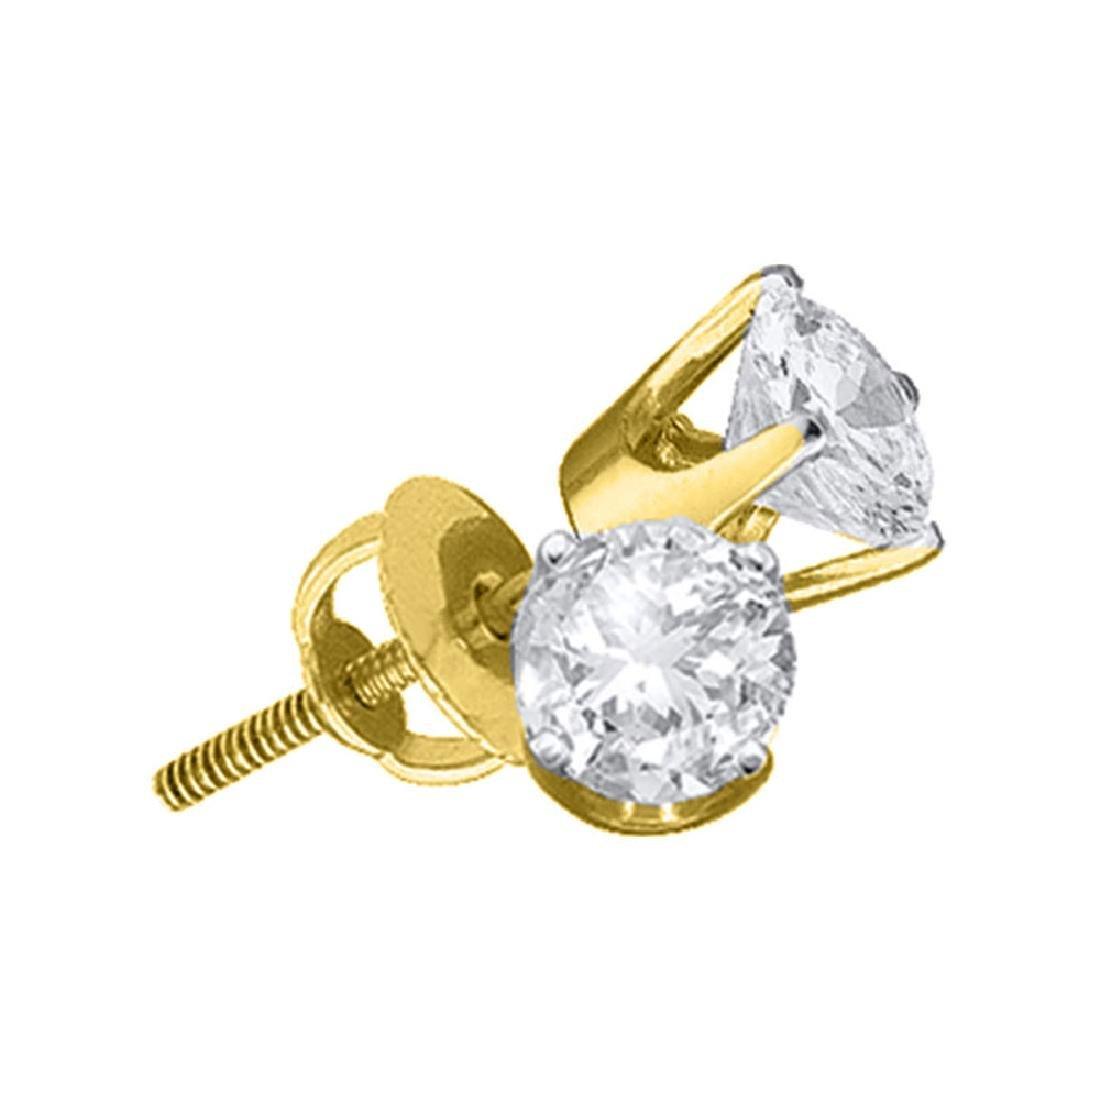 0.37 CTW Diamond Solitaire Stud Earrings 14KT Yellow